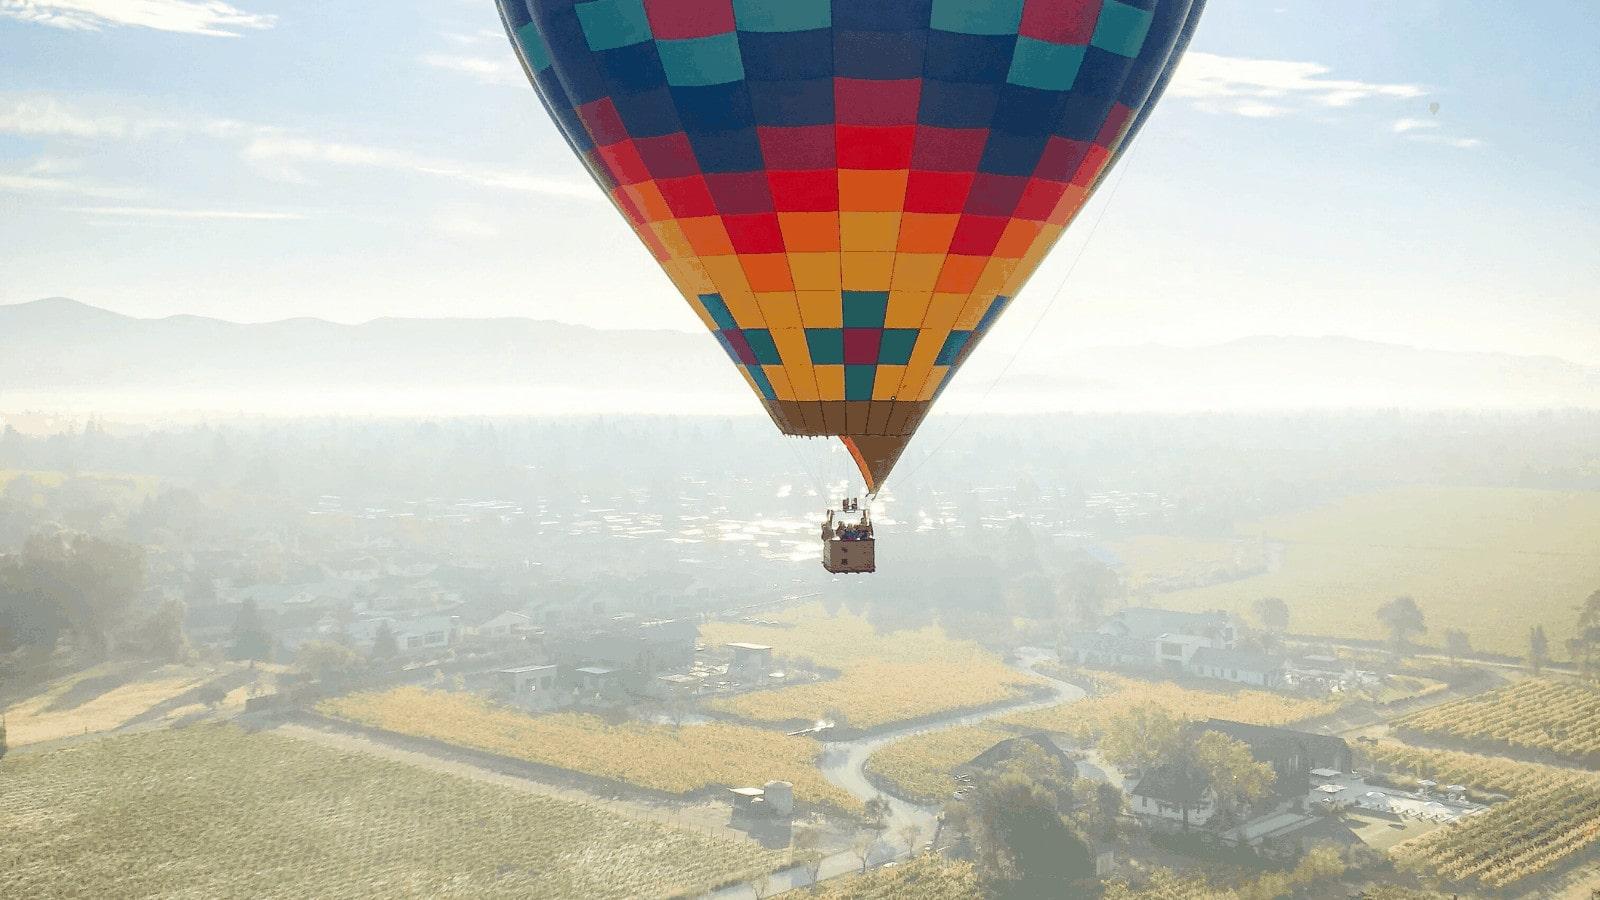 Napa Valley Aloft Balloon Rides